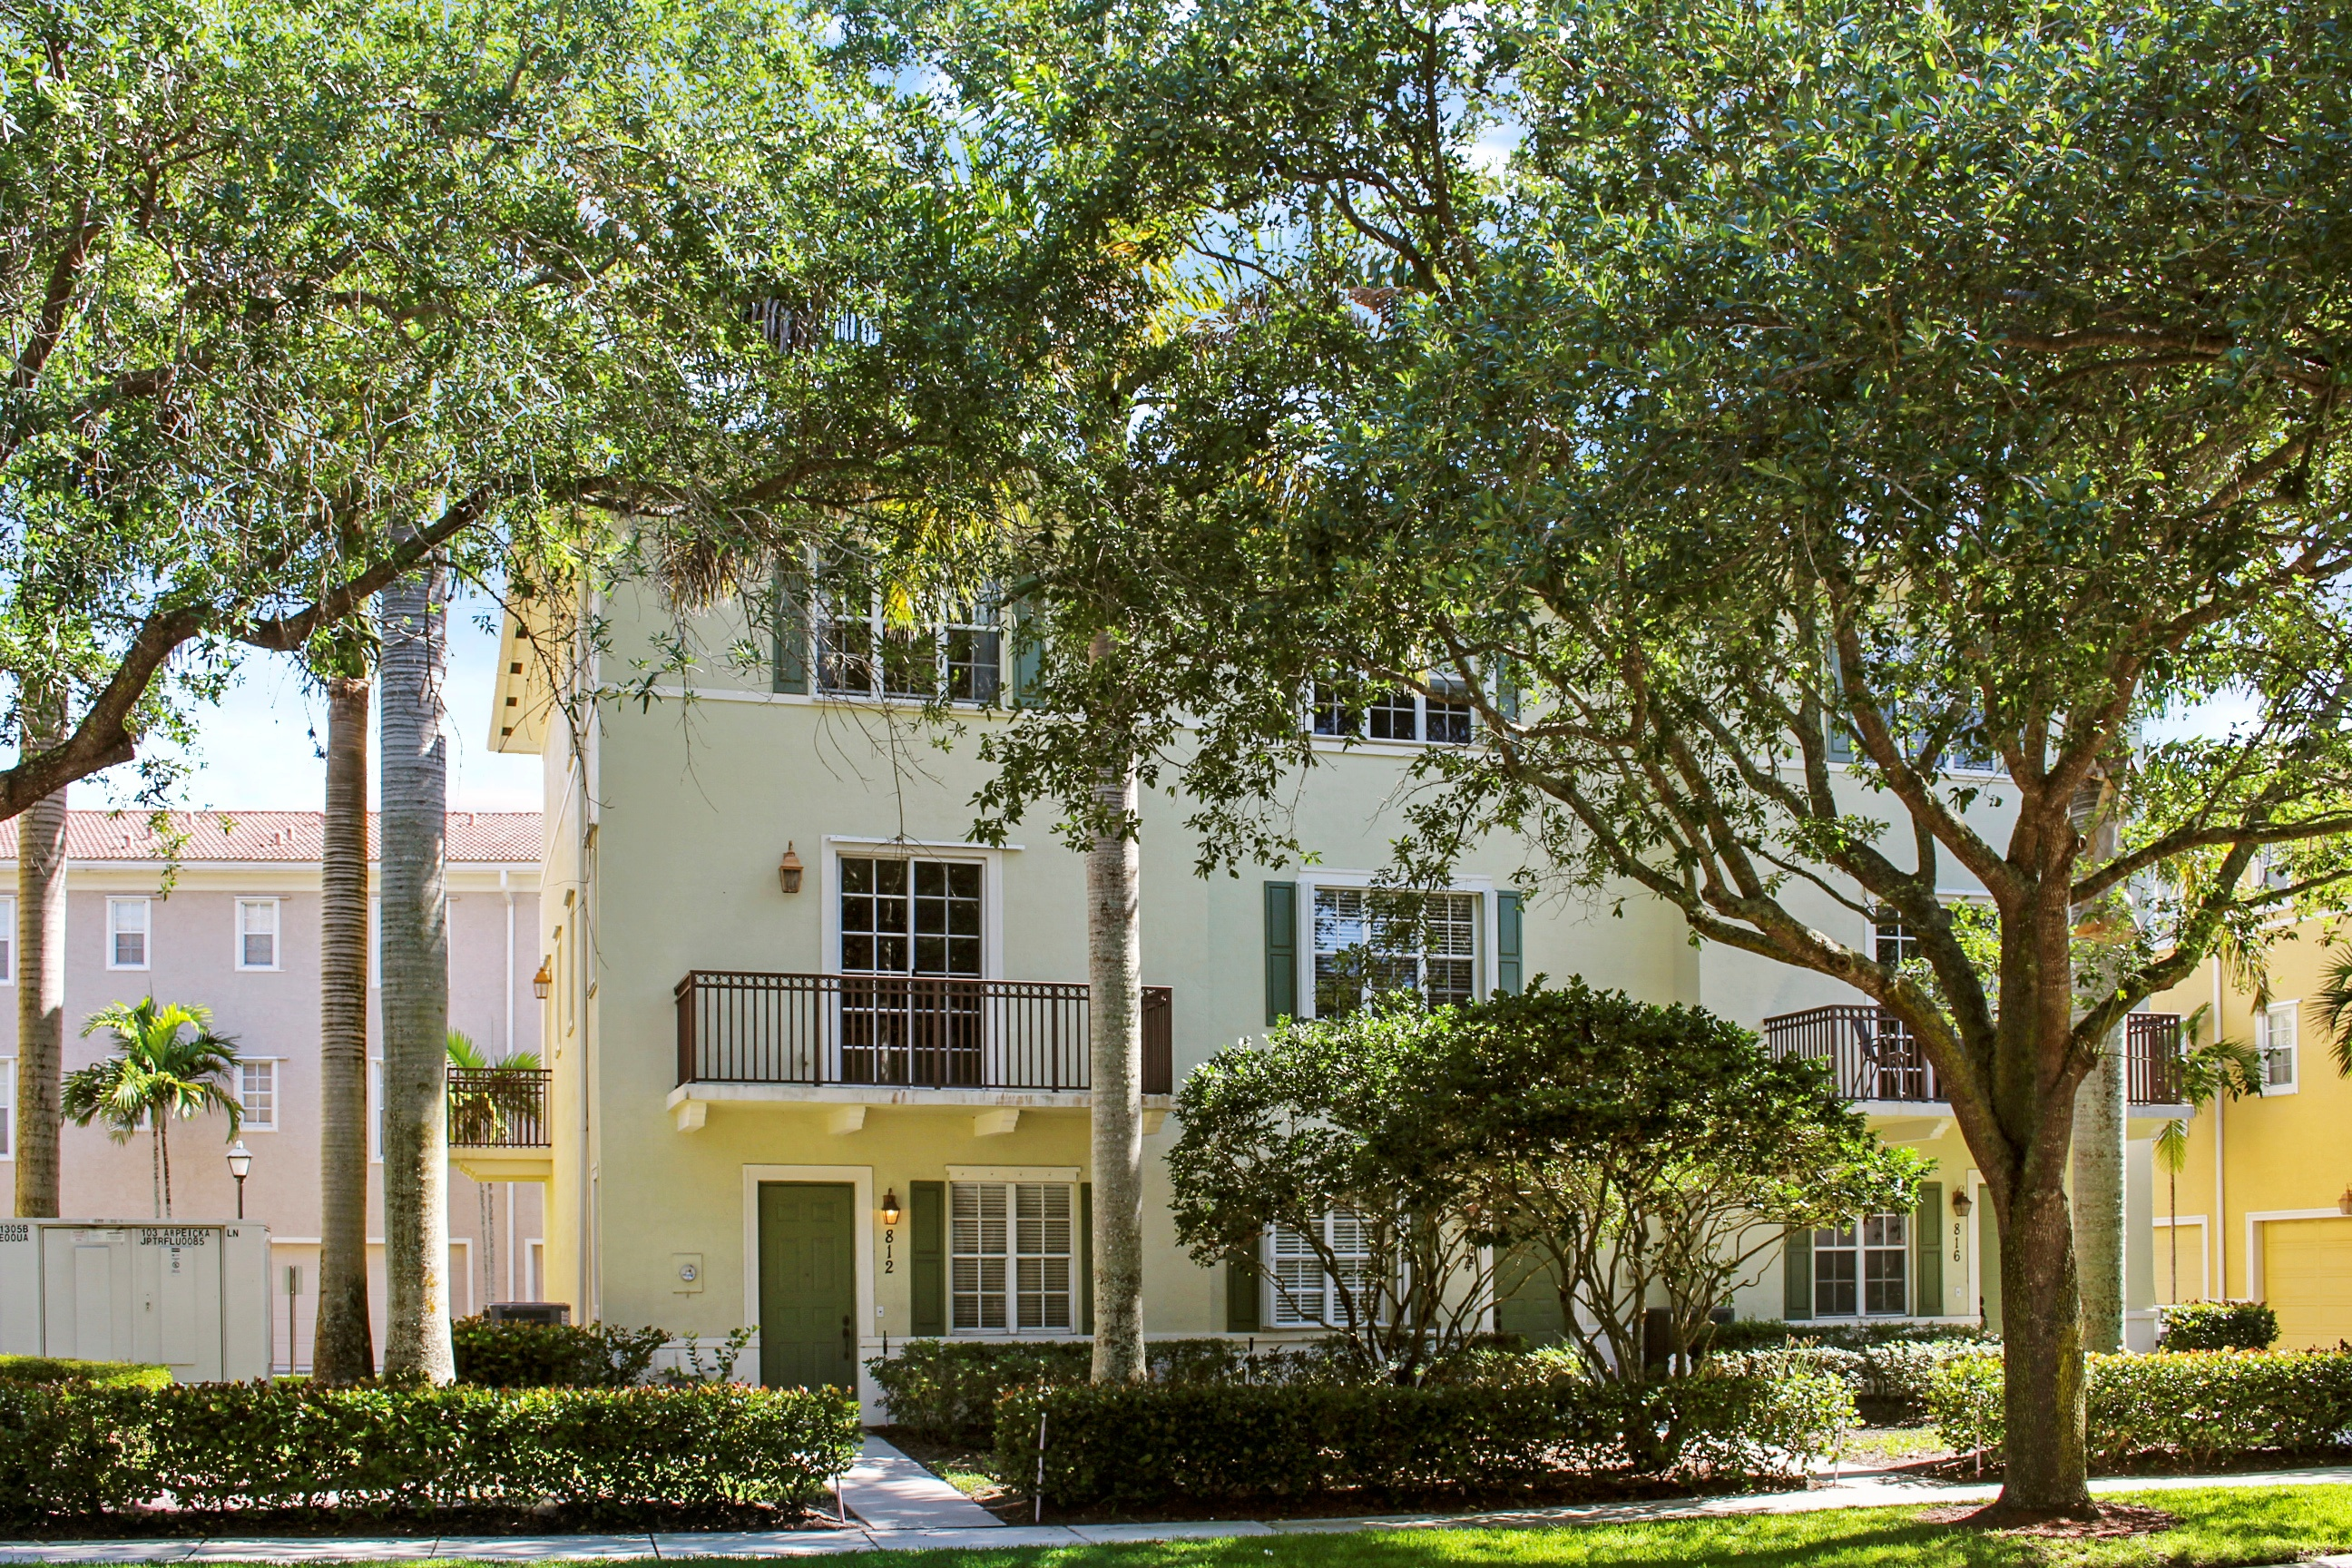 812 University Blvd, Jupiter, FL 33458 was sold by top Jupiter agents in Osceola Woods